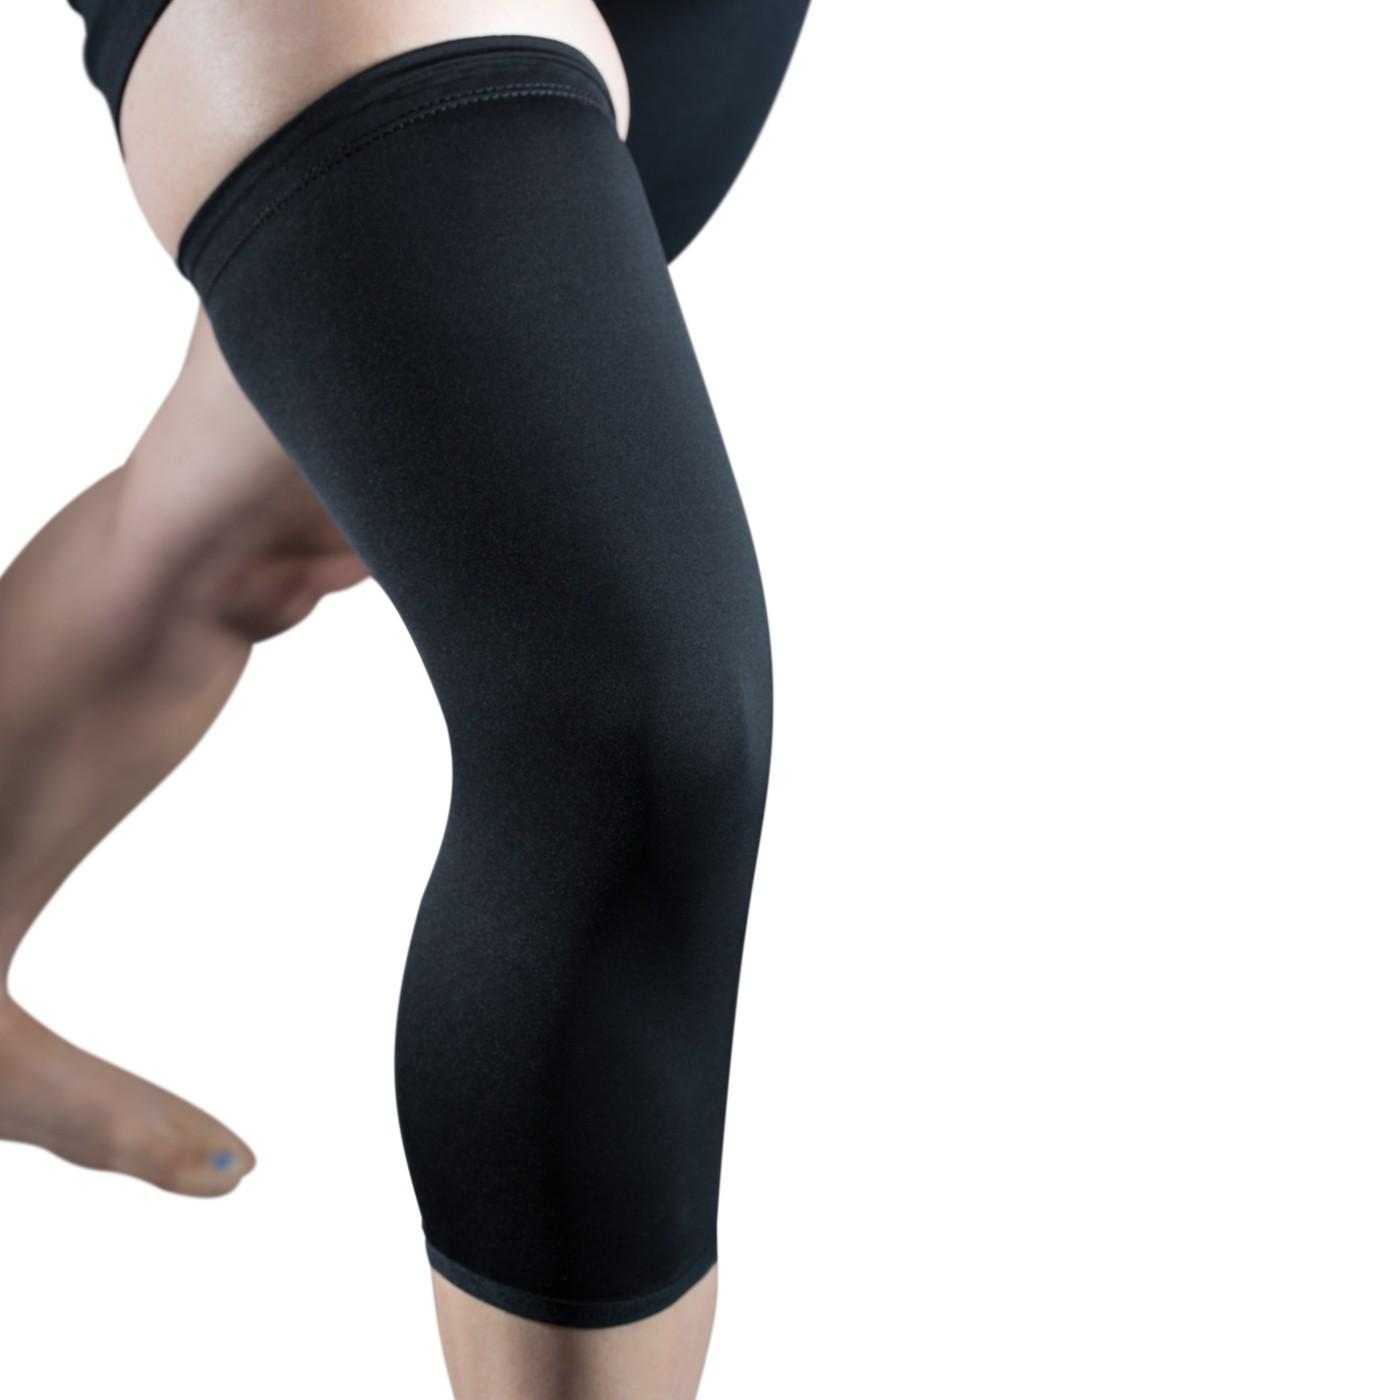 f2f4b40a32 Donjoy OA Reaction Web Knee Brace | Osteoarthritis Knee Brace